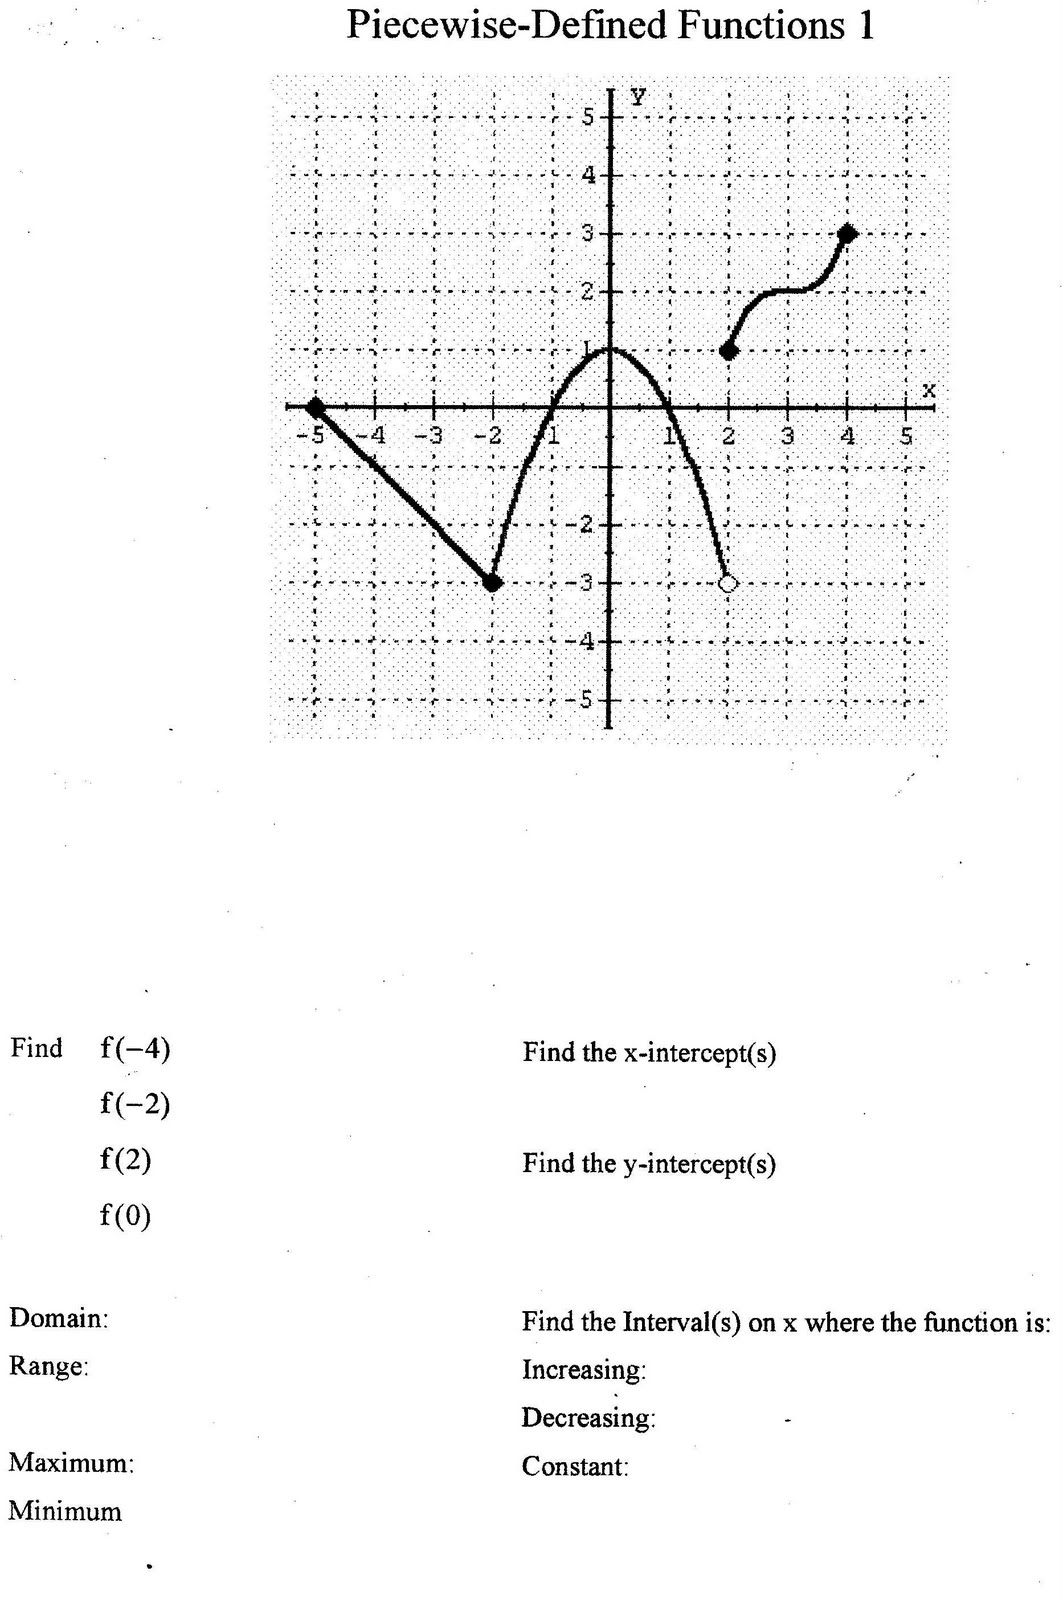 Mr. Suominen's Math Homepage: Domain, Range, Trig, Piece